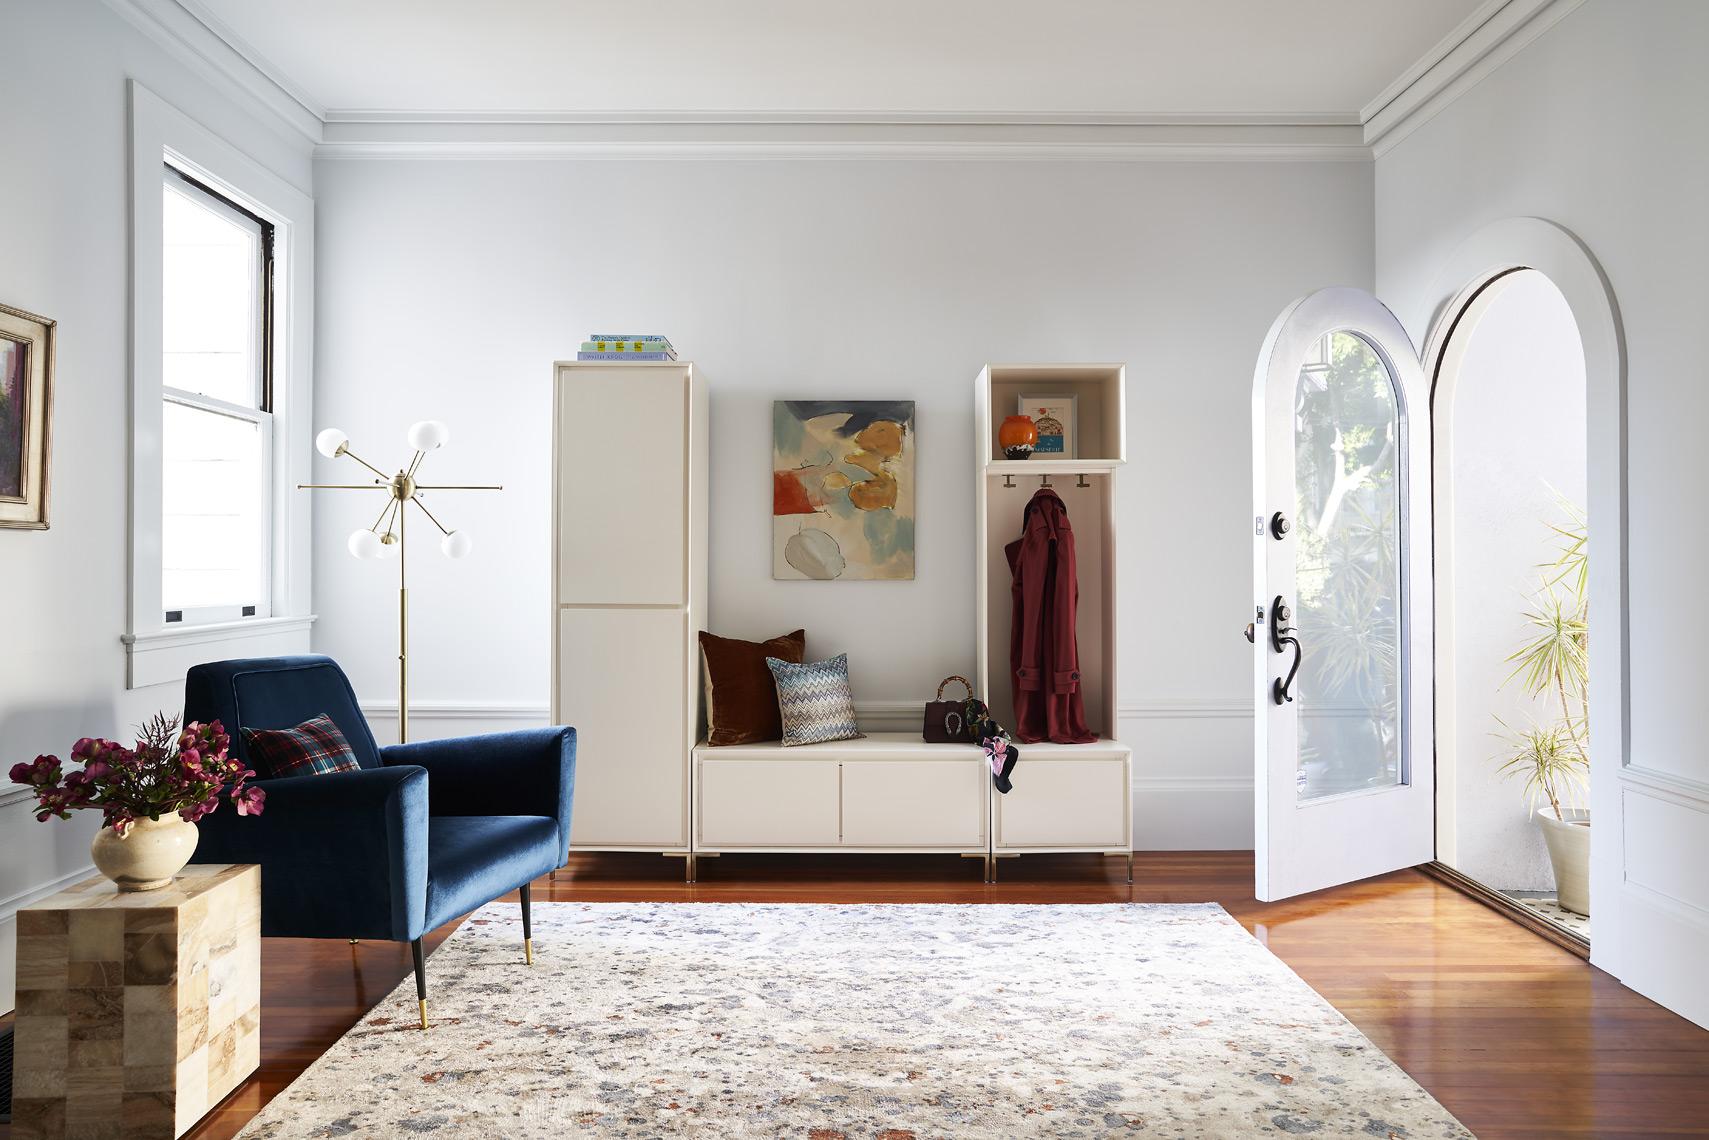 rterior-studio-los-angeles-ca-edwardian-beauty-entry-way-door-open